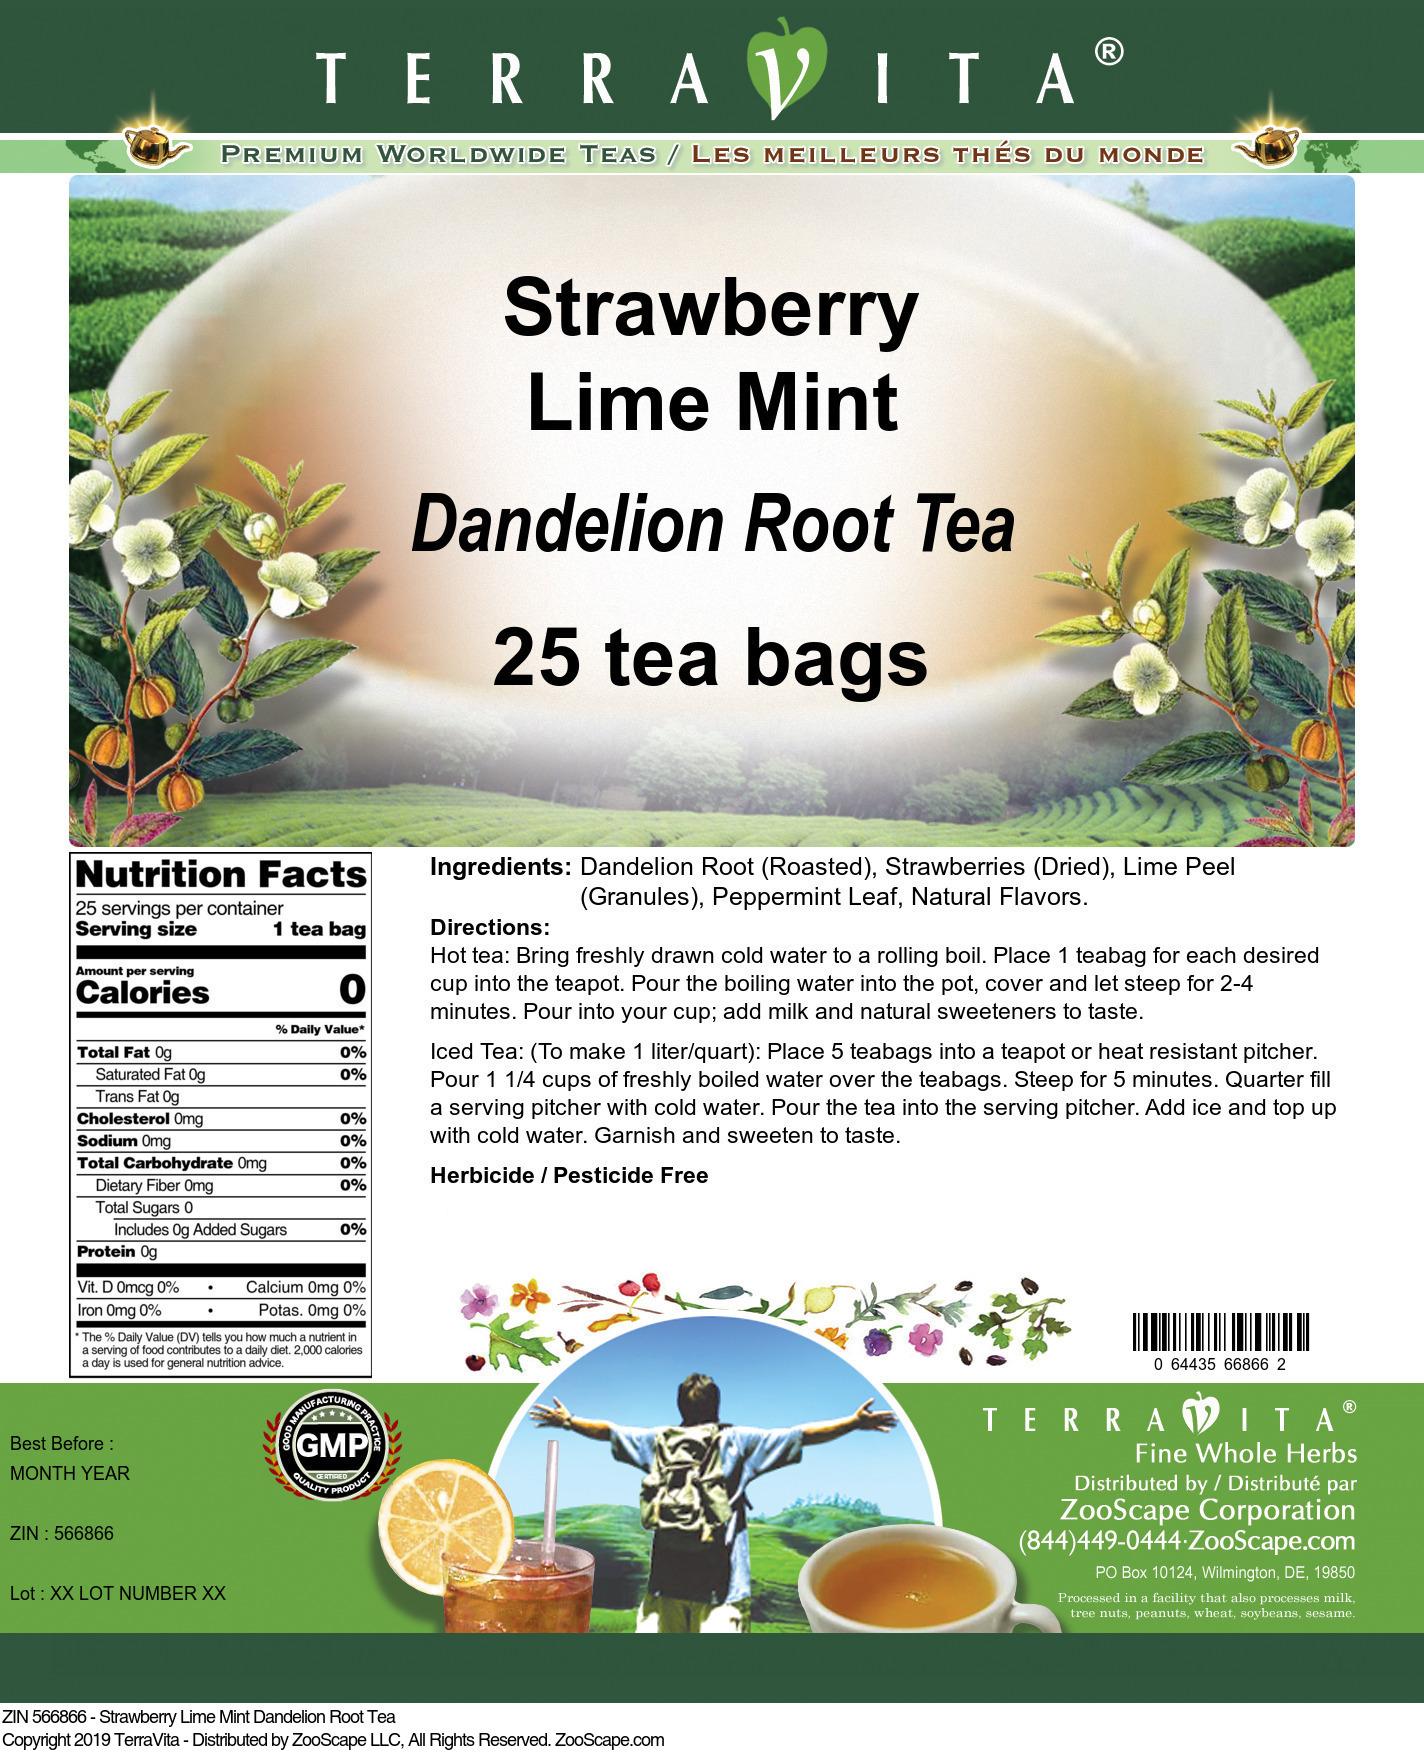 Strawberry Lime Mint Dandelion Root Tea